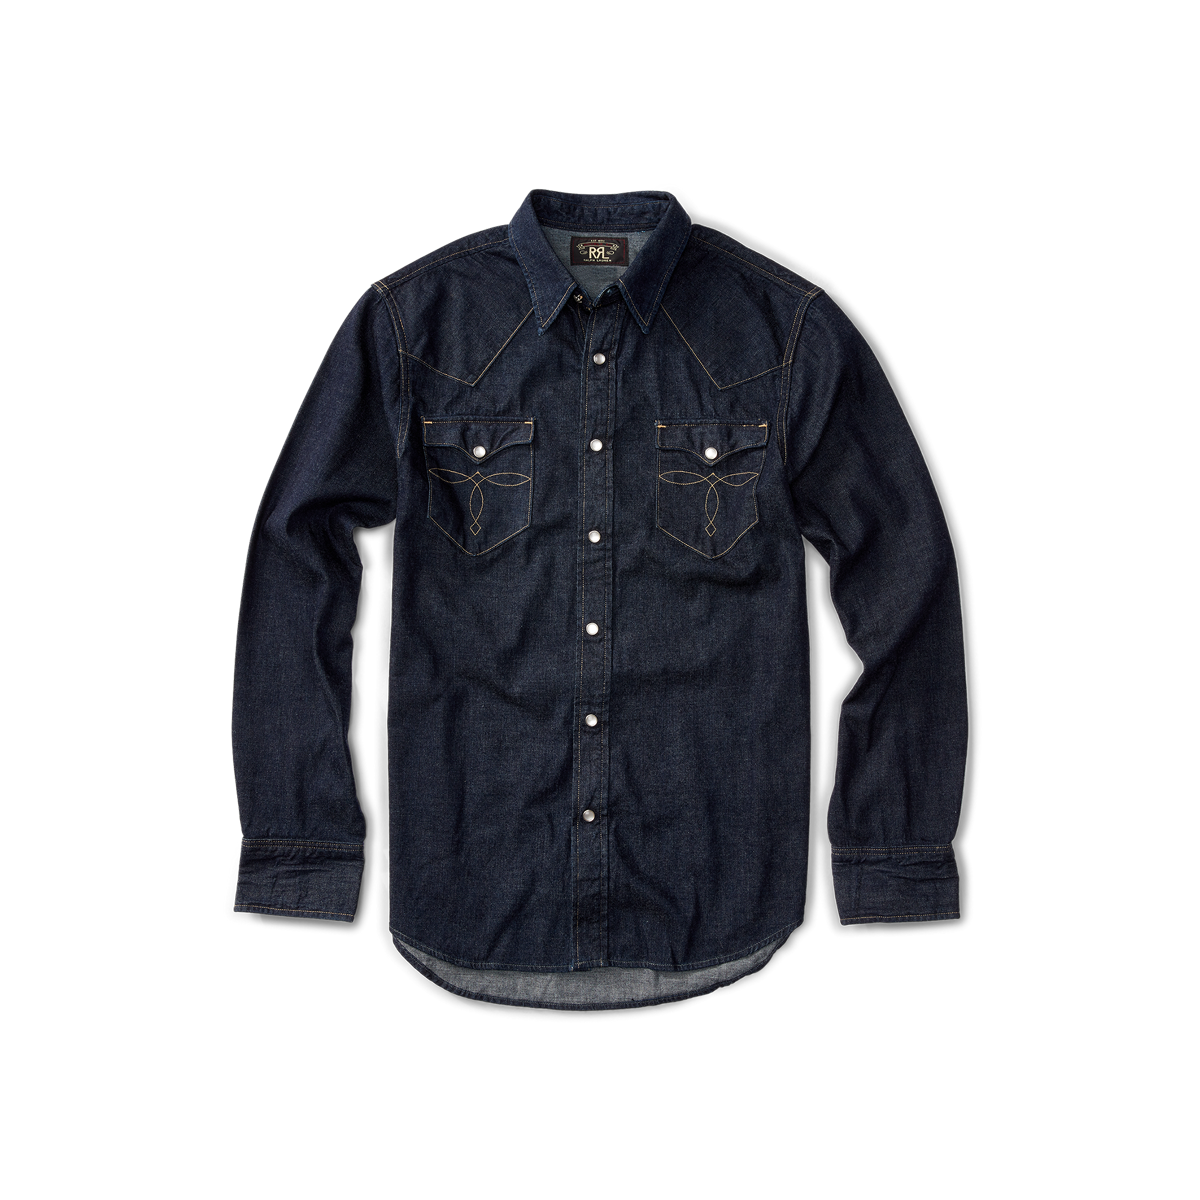 b842437d29 Slim-Fit Denim Western Shirt